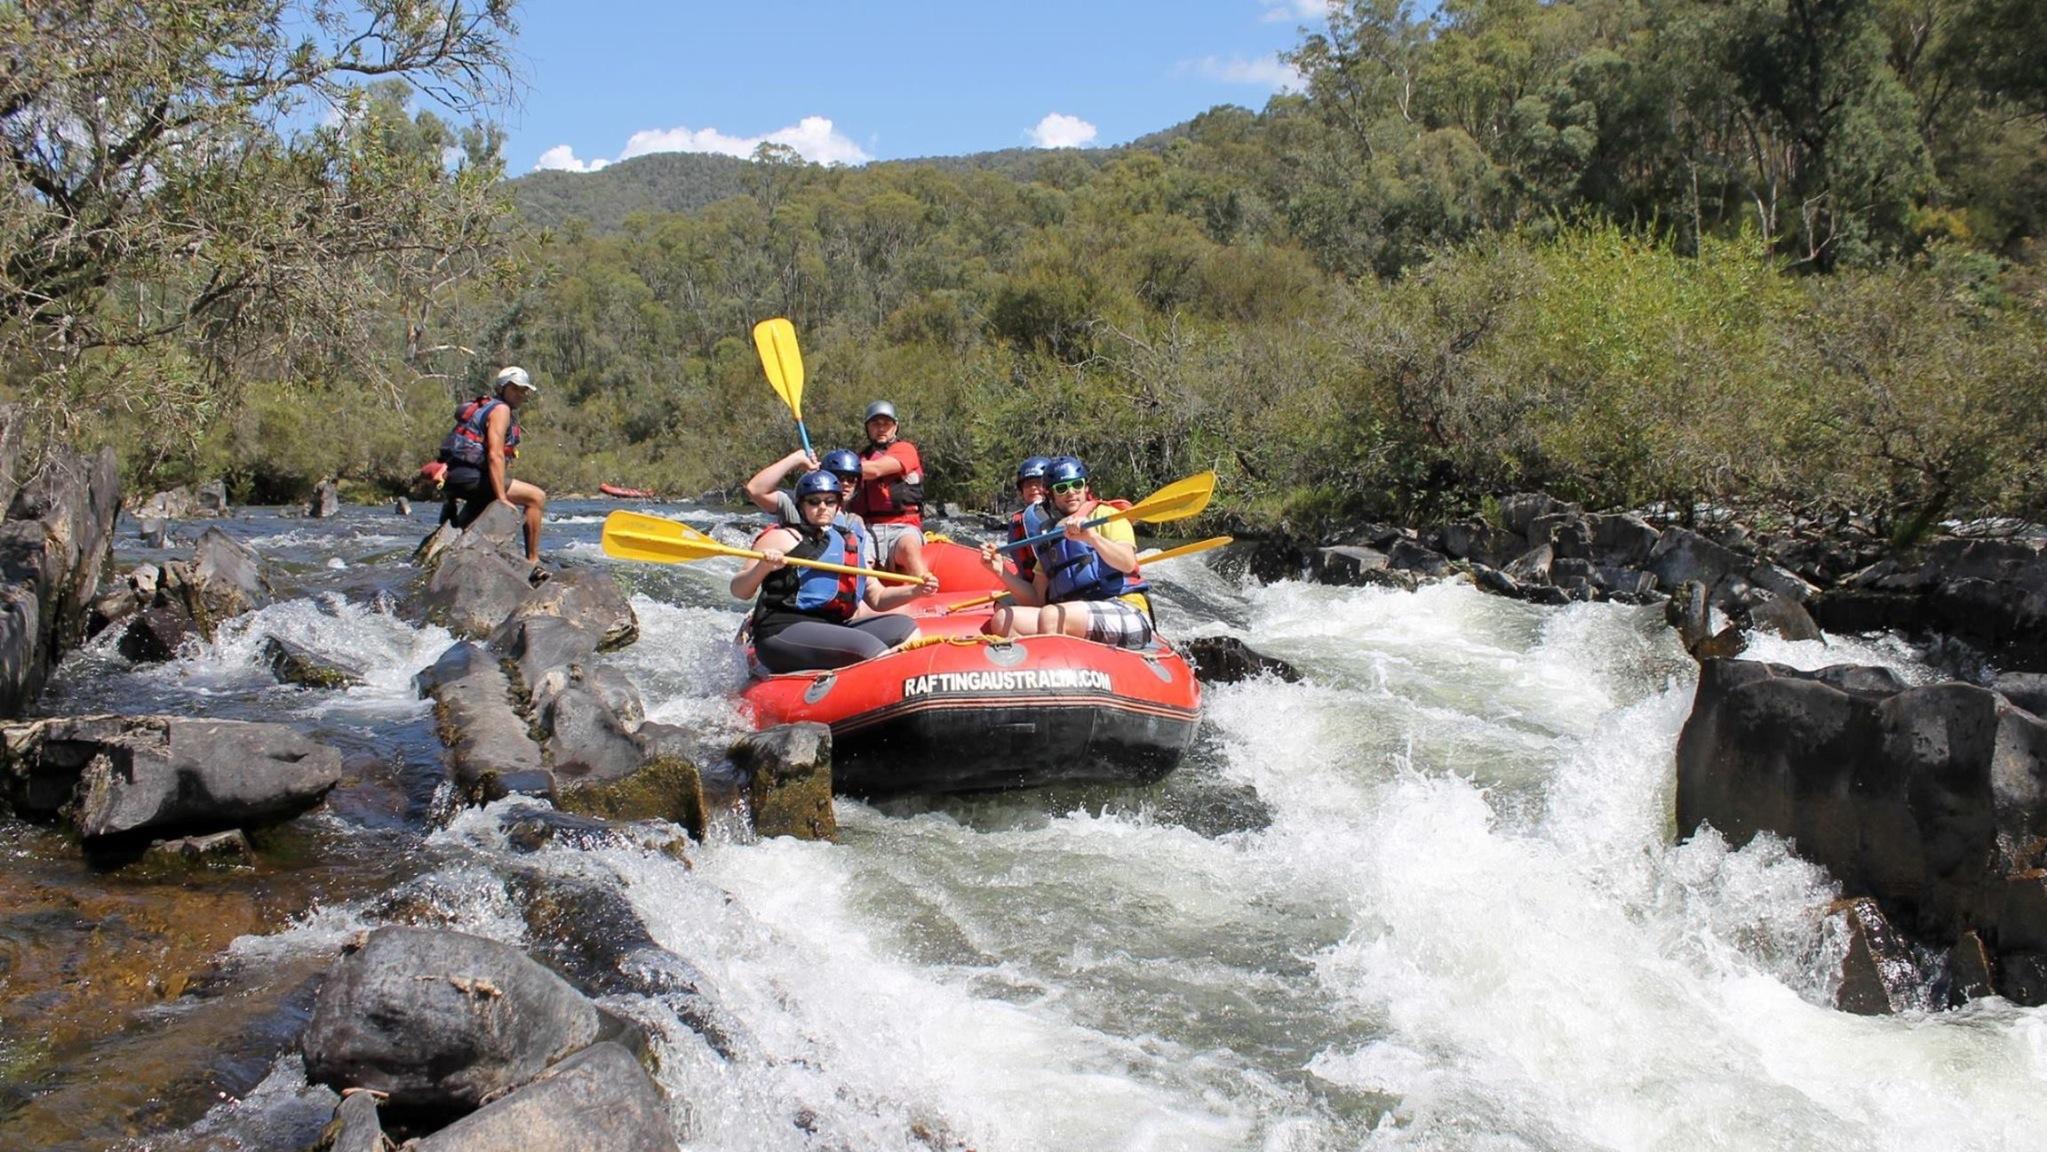 Rafting Australia